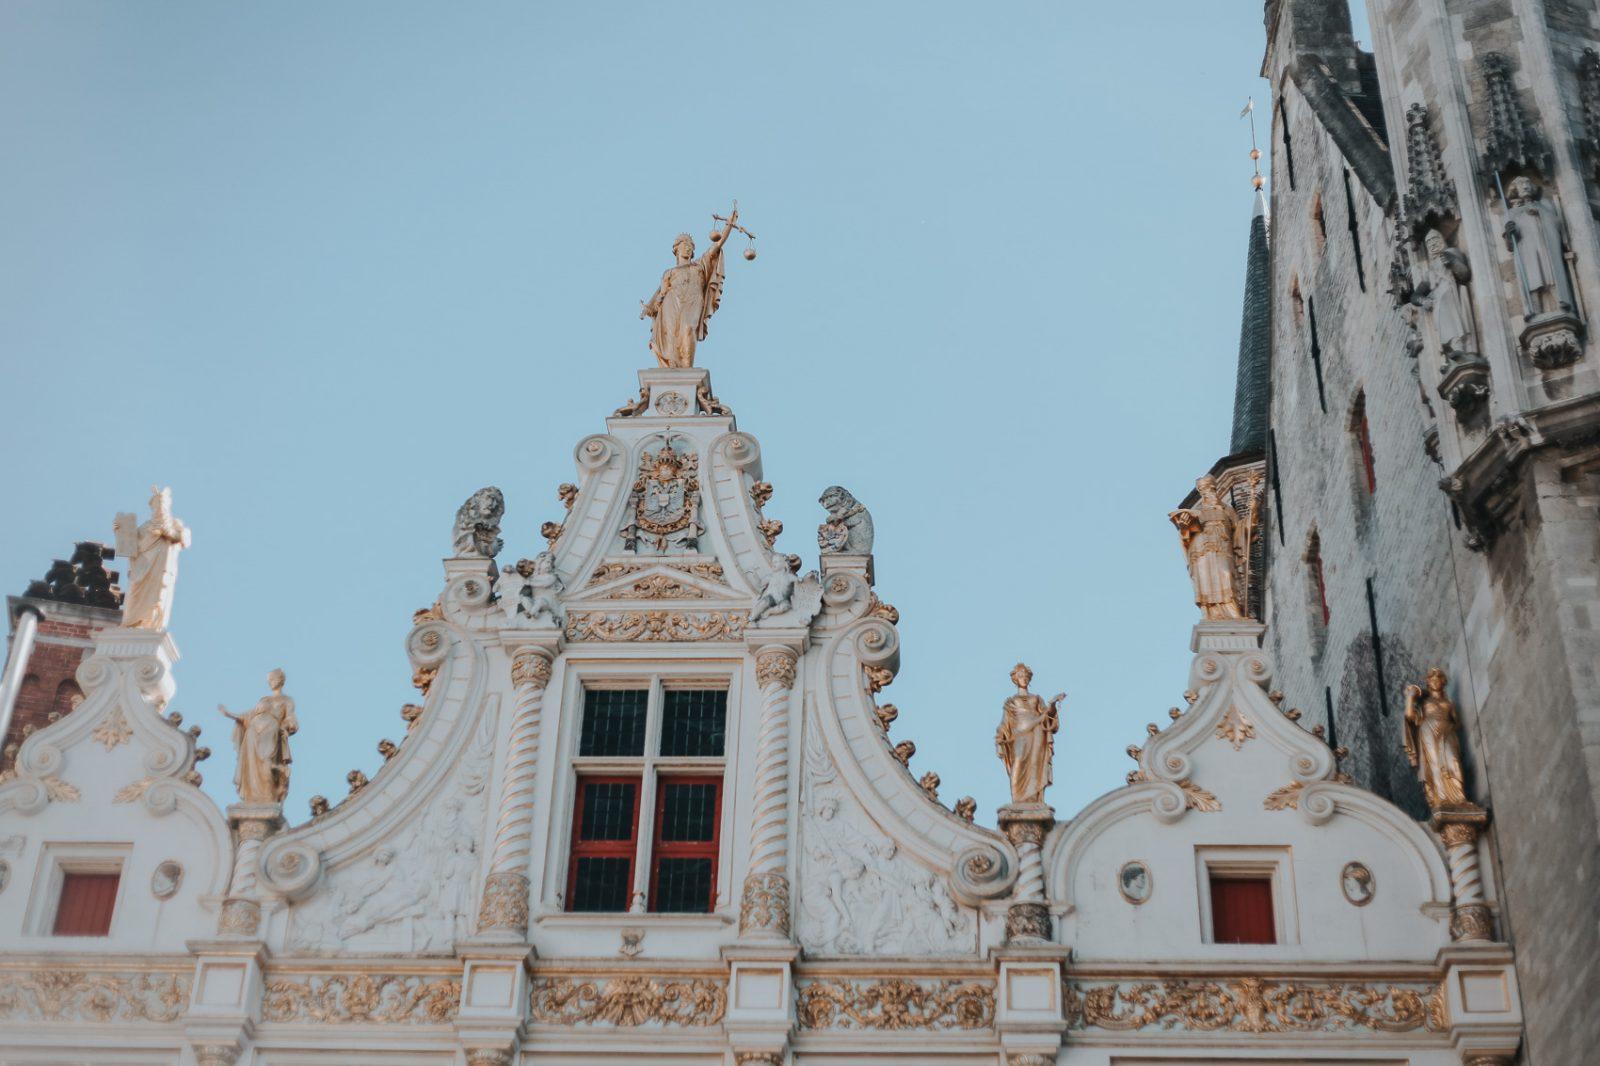 Architecture in Burg Square in Bruges